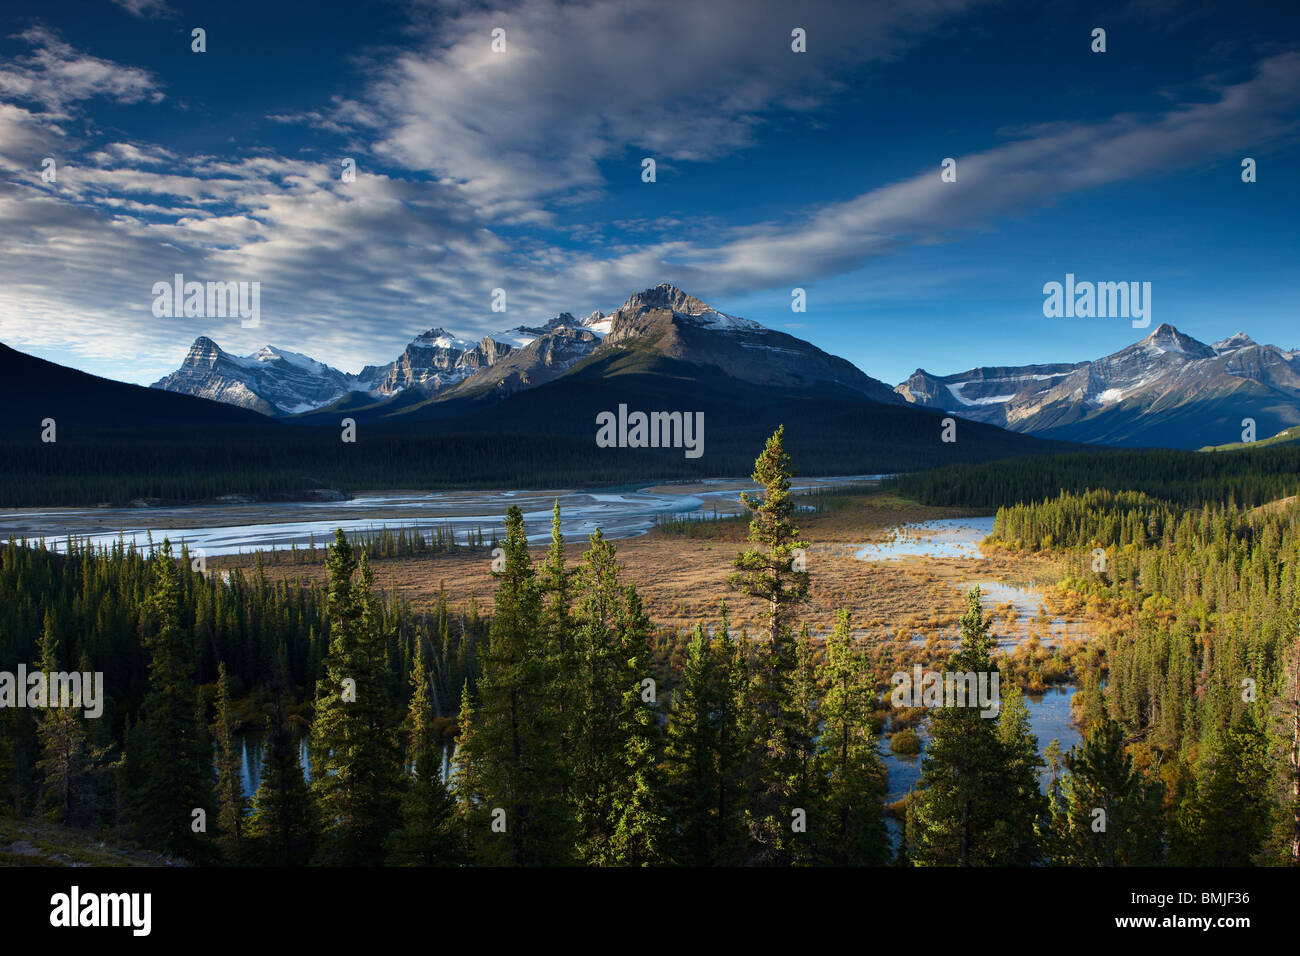 Howse Fluss und werden Berge, Saskatchewan Crossing, Banff Nationalpark, Alberta, Kanada Stockbild